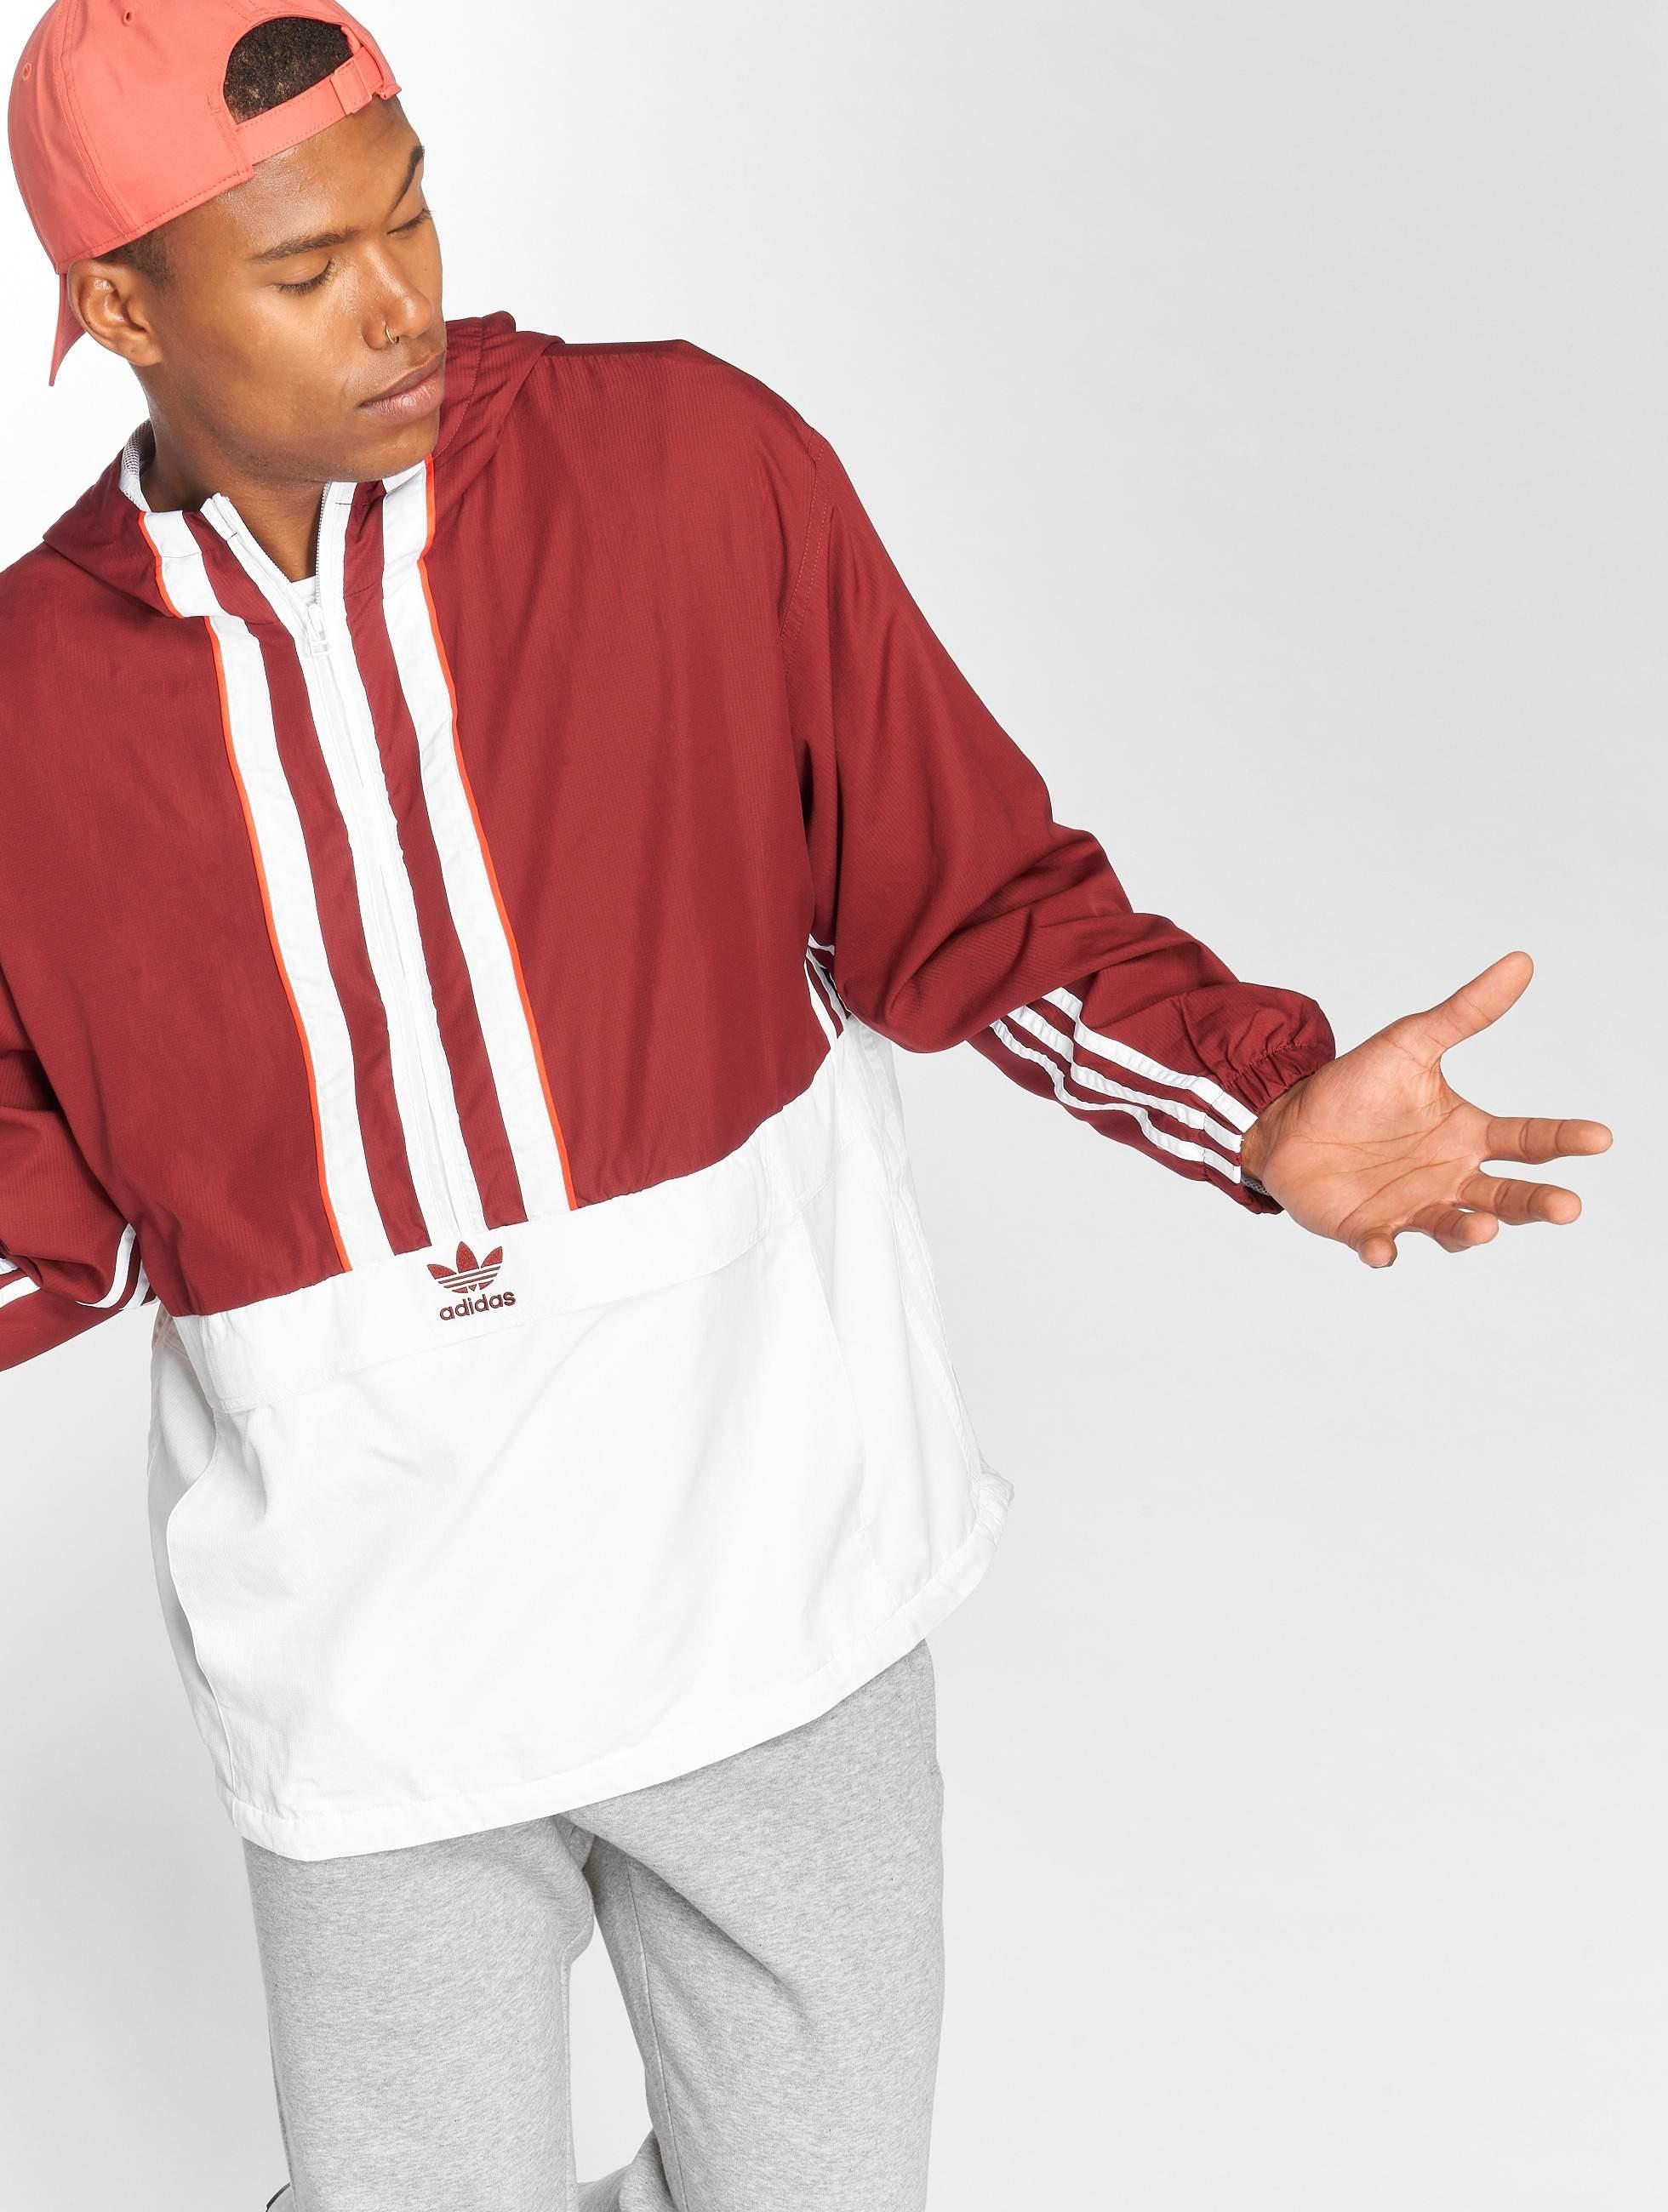 Mi Transition Auth Anorak Originals Homme Veste Rouge 6qx55aa7 Adidas 8n0PwXOk